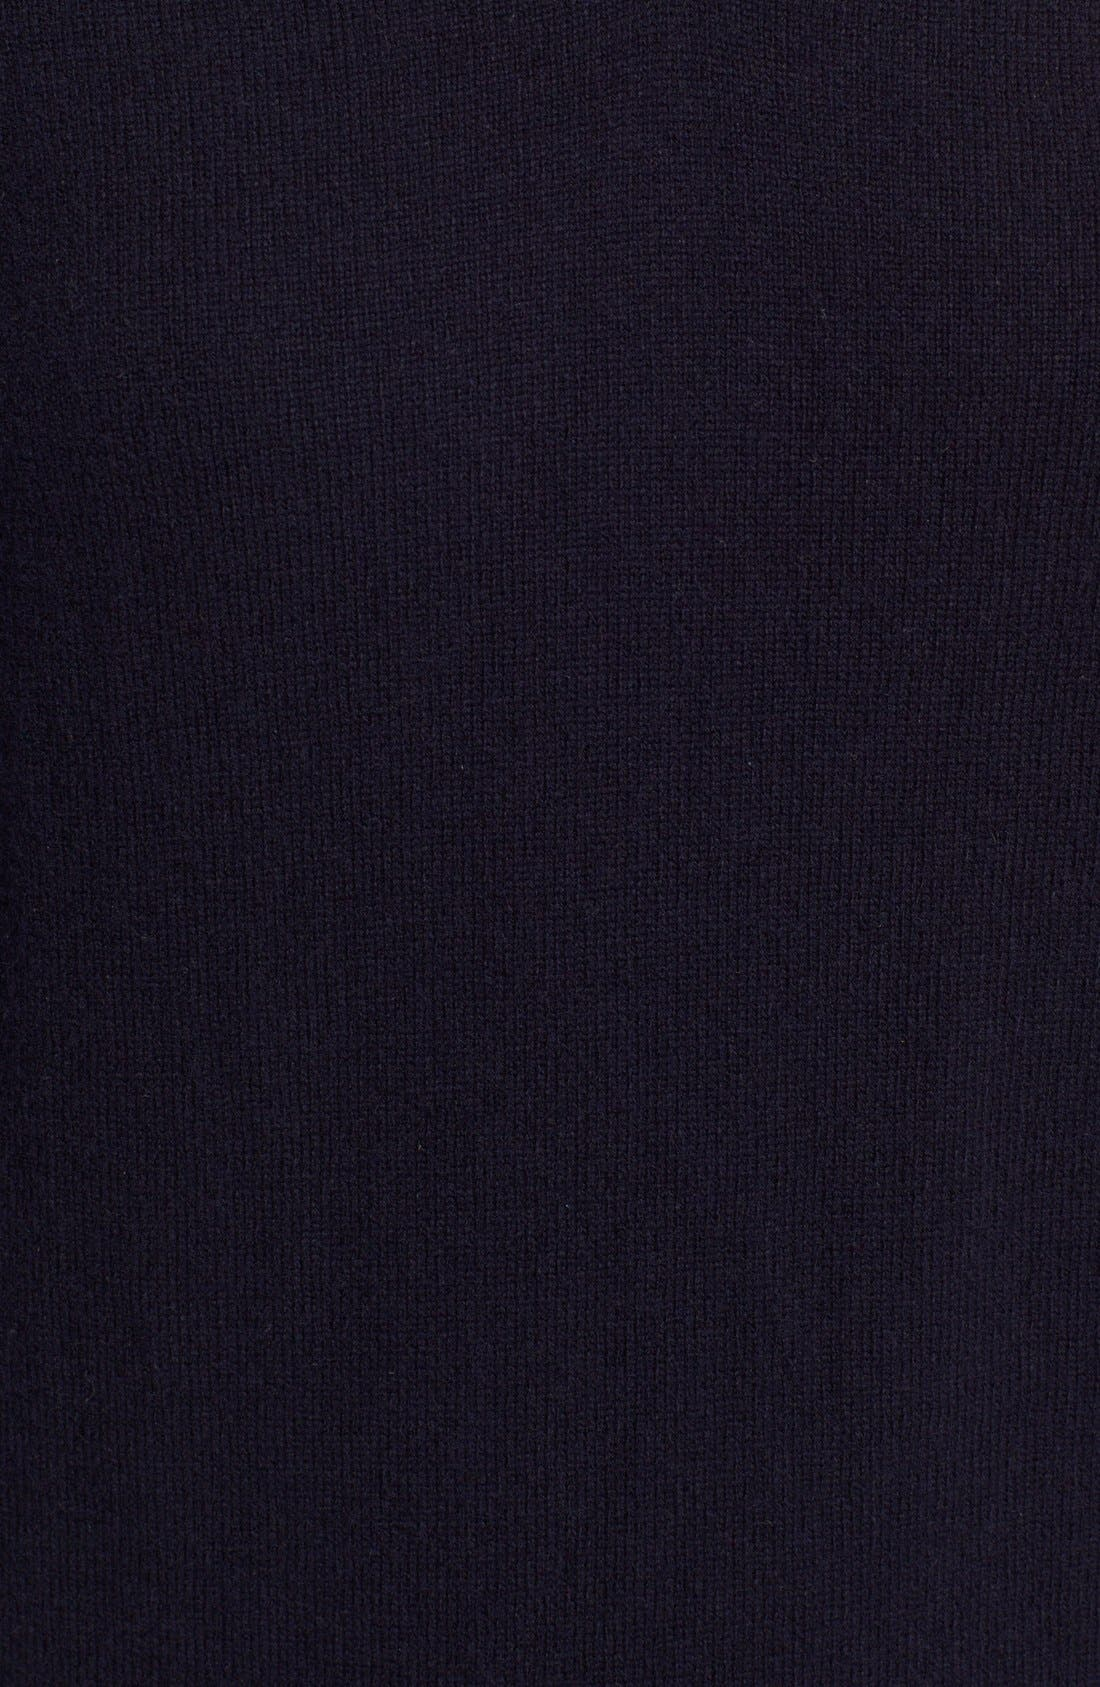 Comme des Garçons 'Play' Wool V-Neck Pullover,                             Alternate thumbnail 5, color,                             Navy